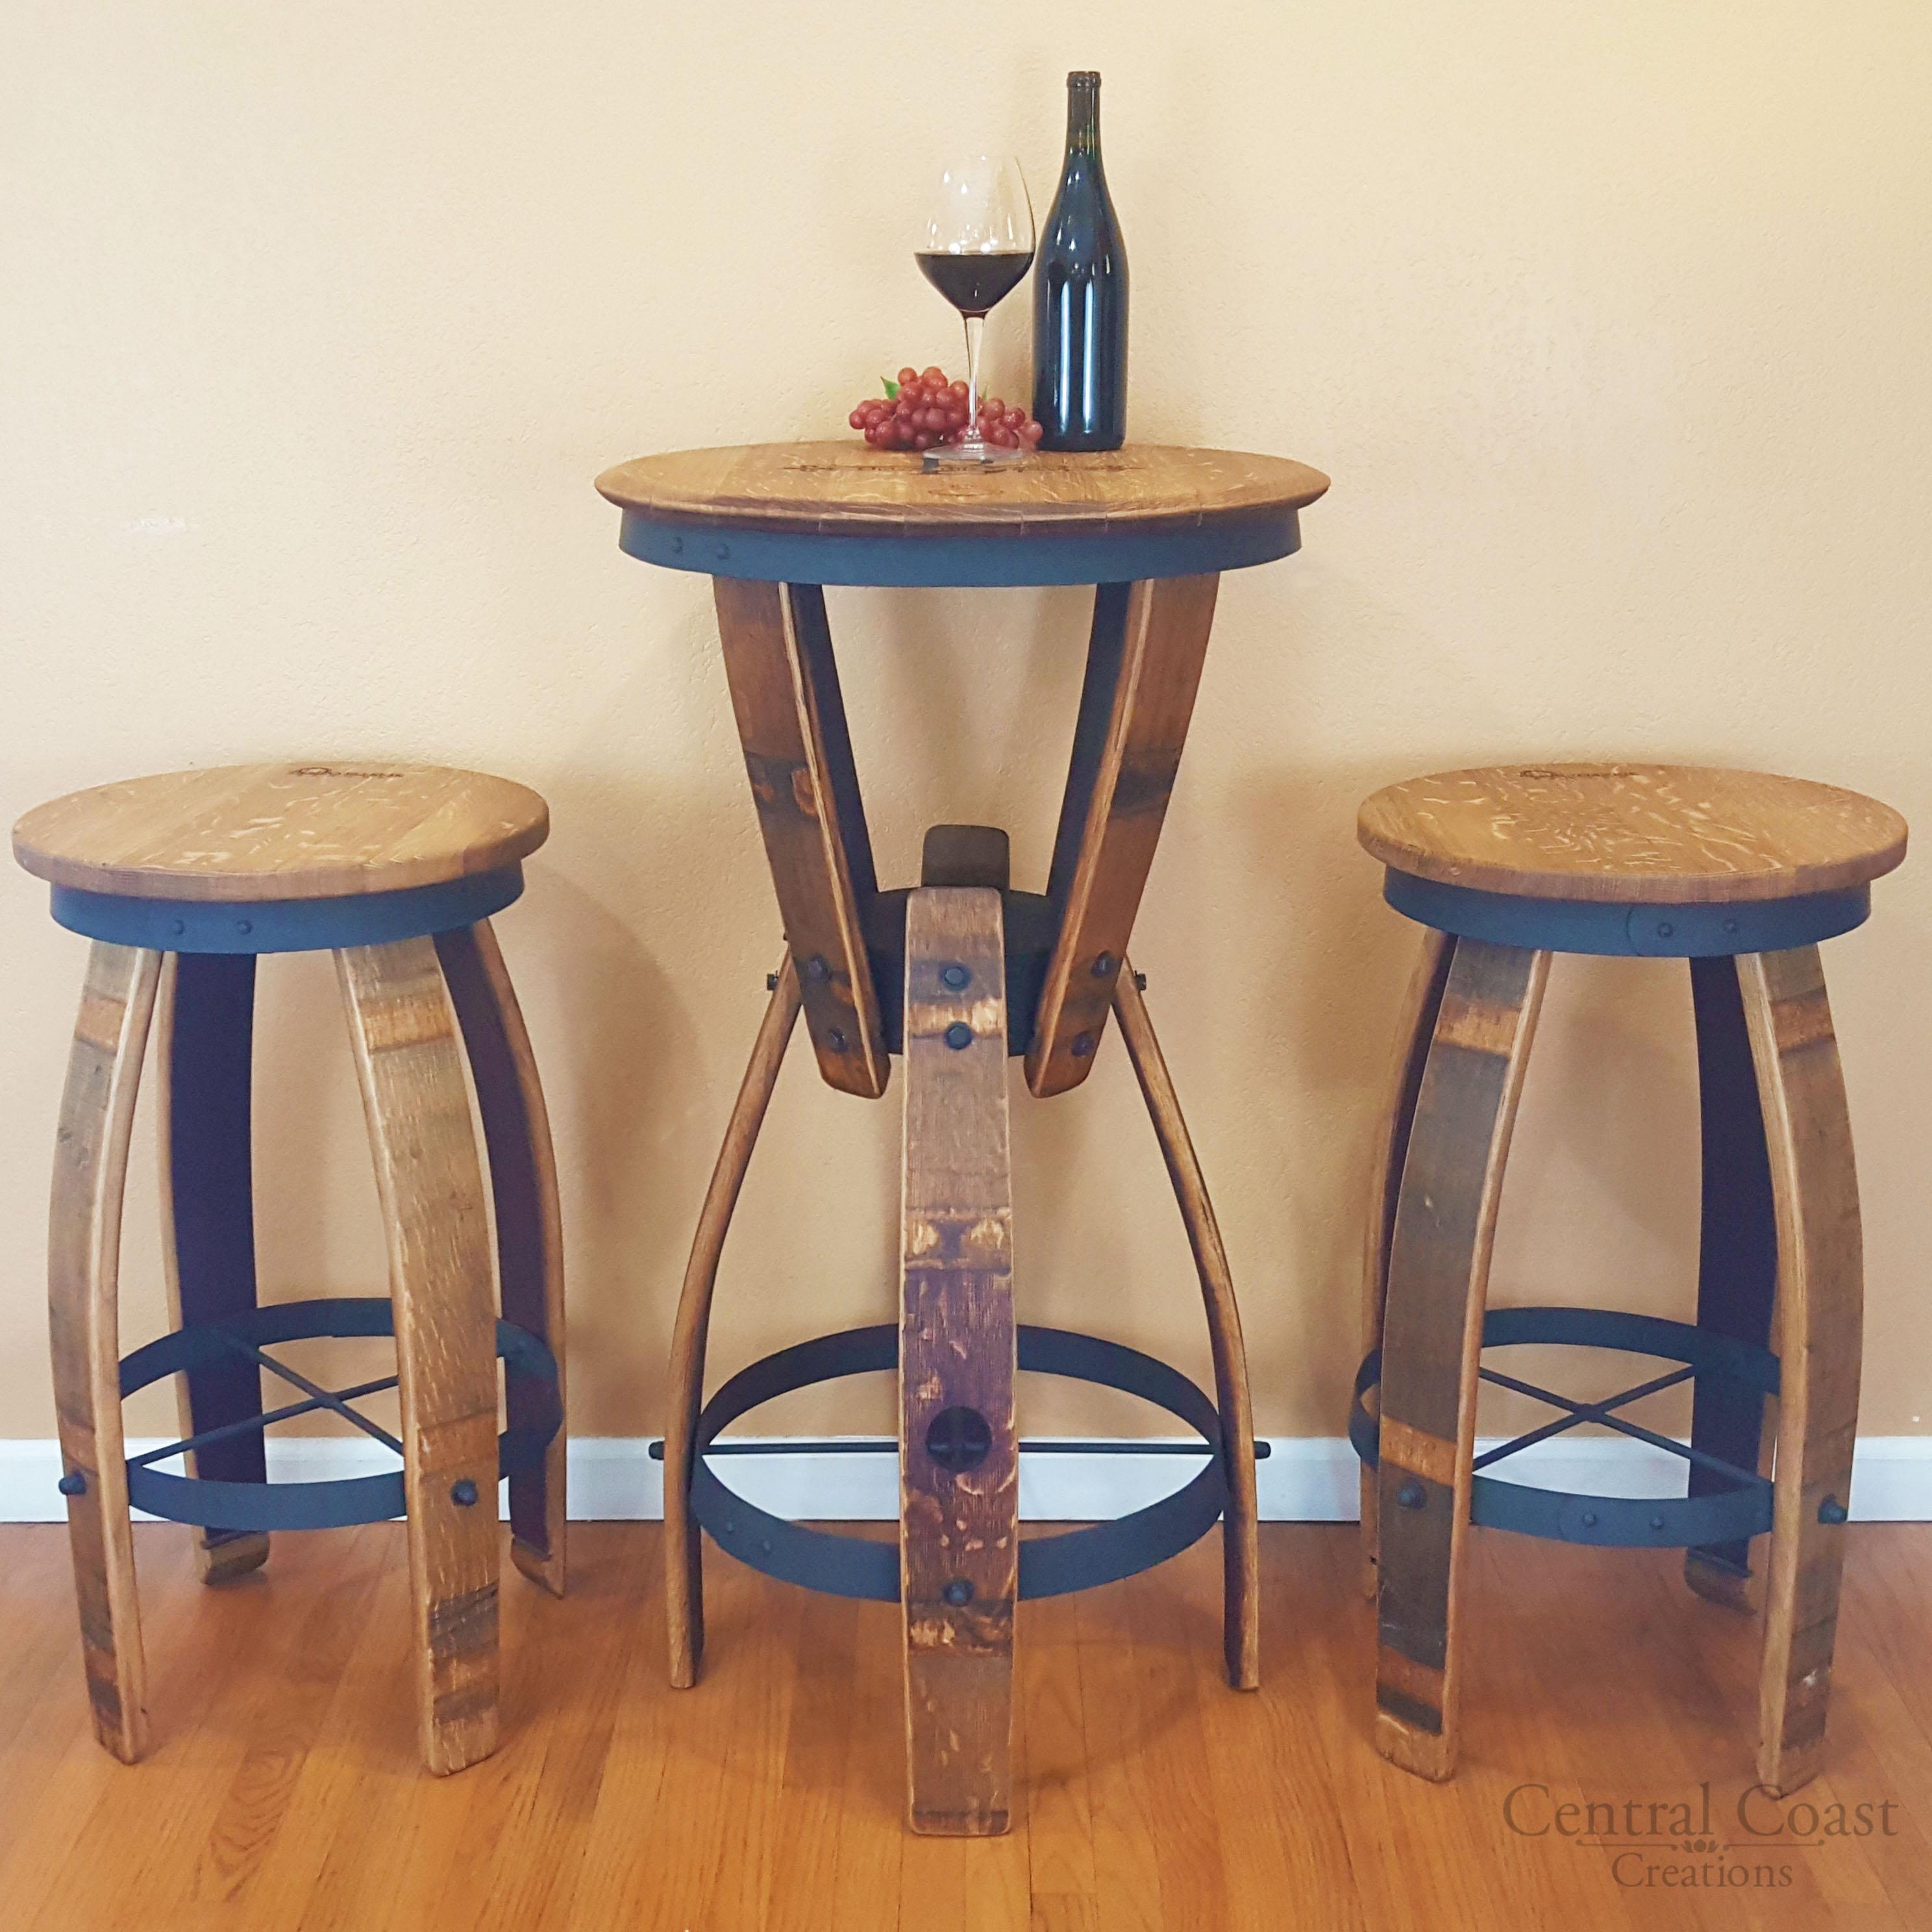 Wine Barrel Furniture Hourglass Pub Table Set Swivel Top Stools Free